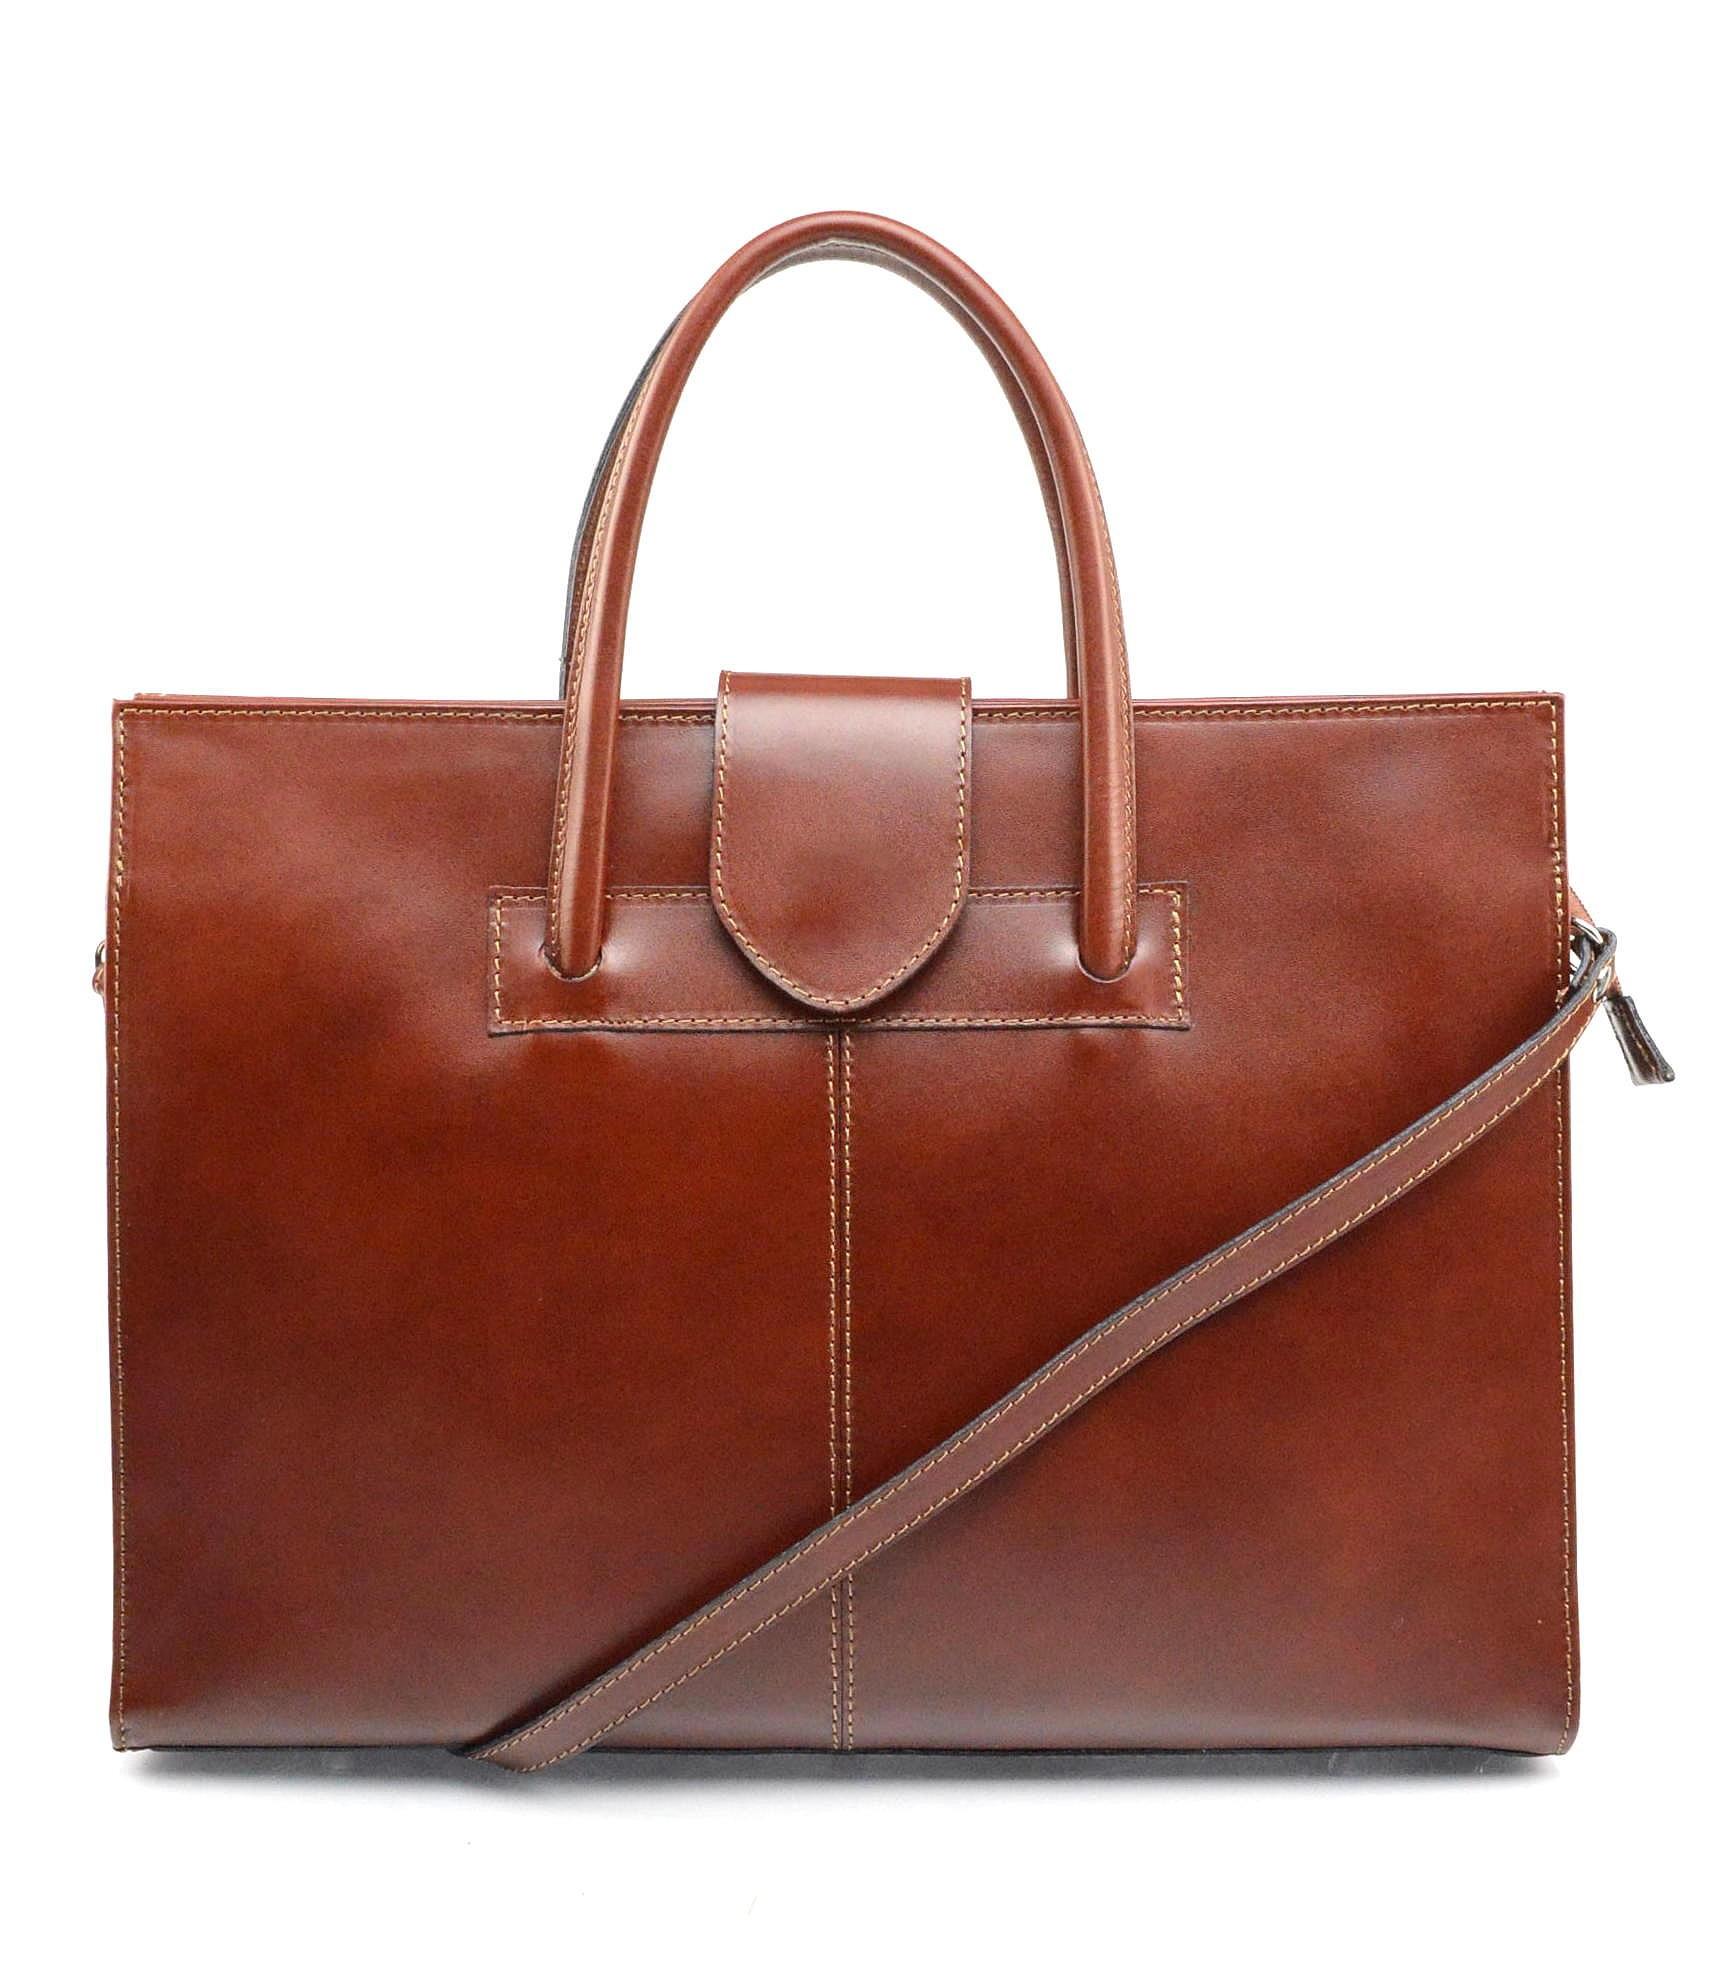 Kožená praktická hnědá brown kabelka Business two